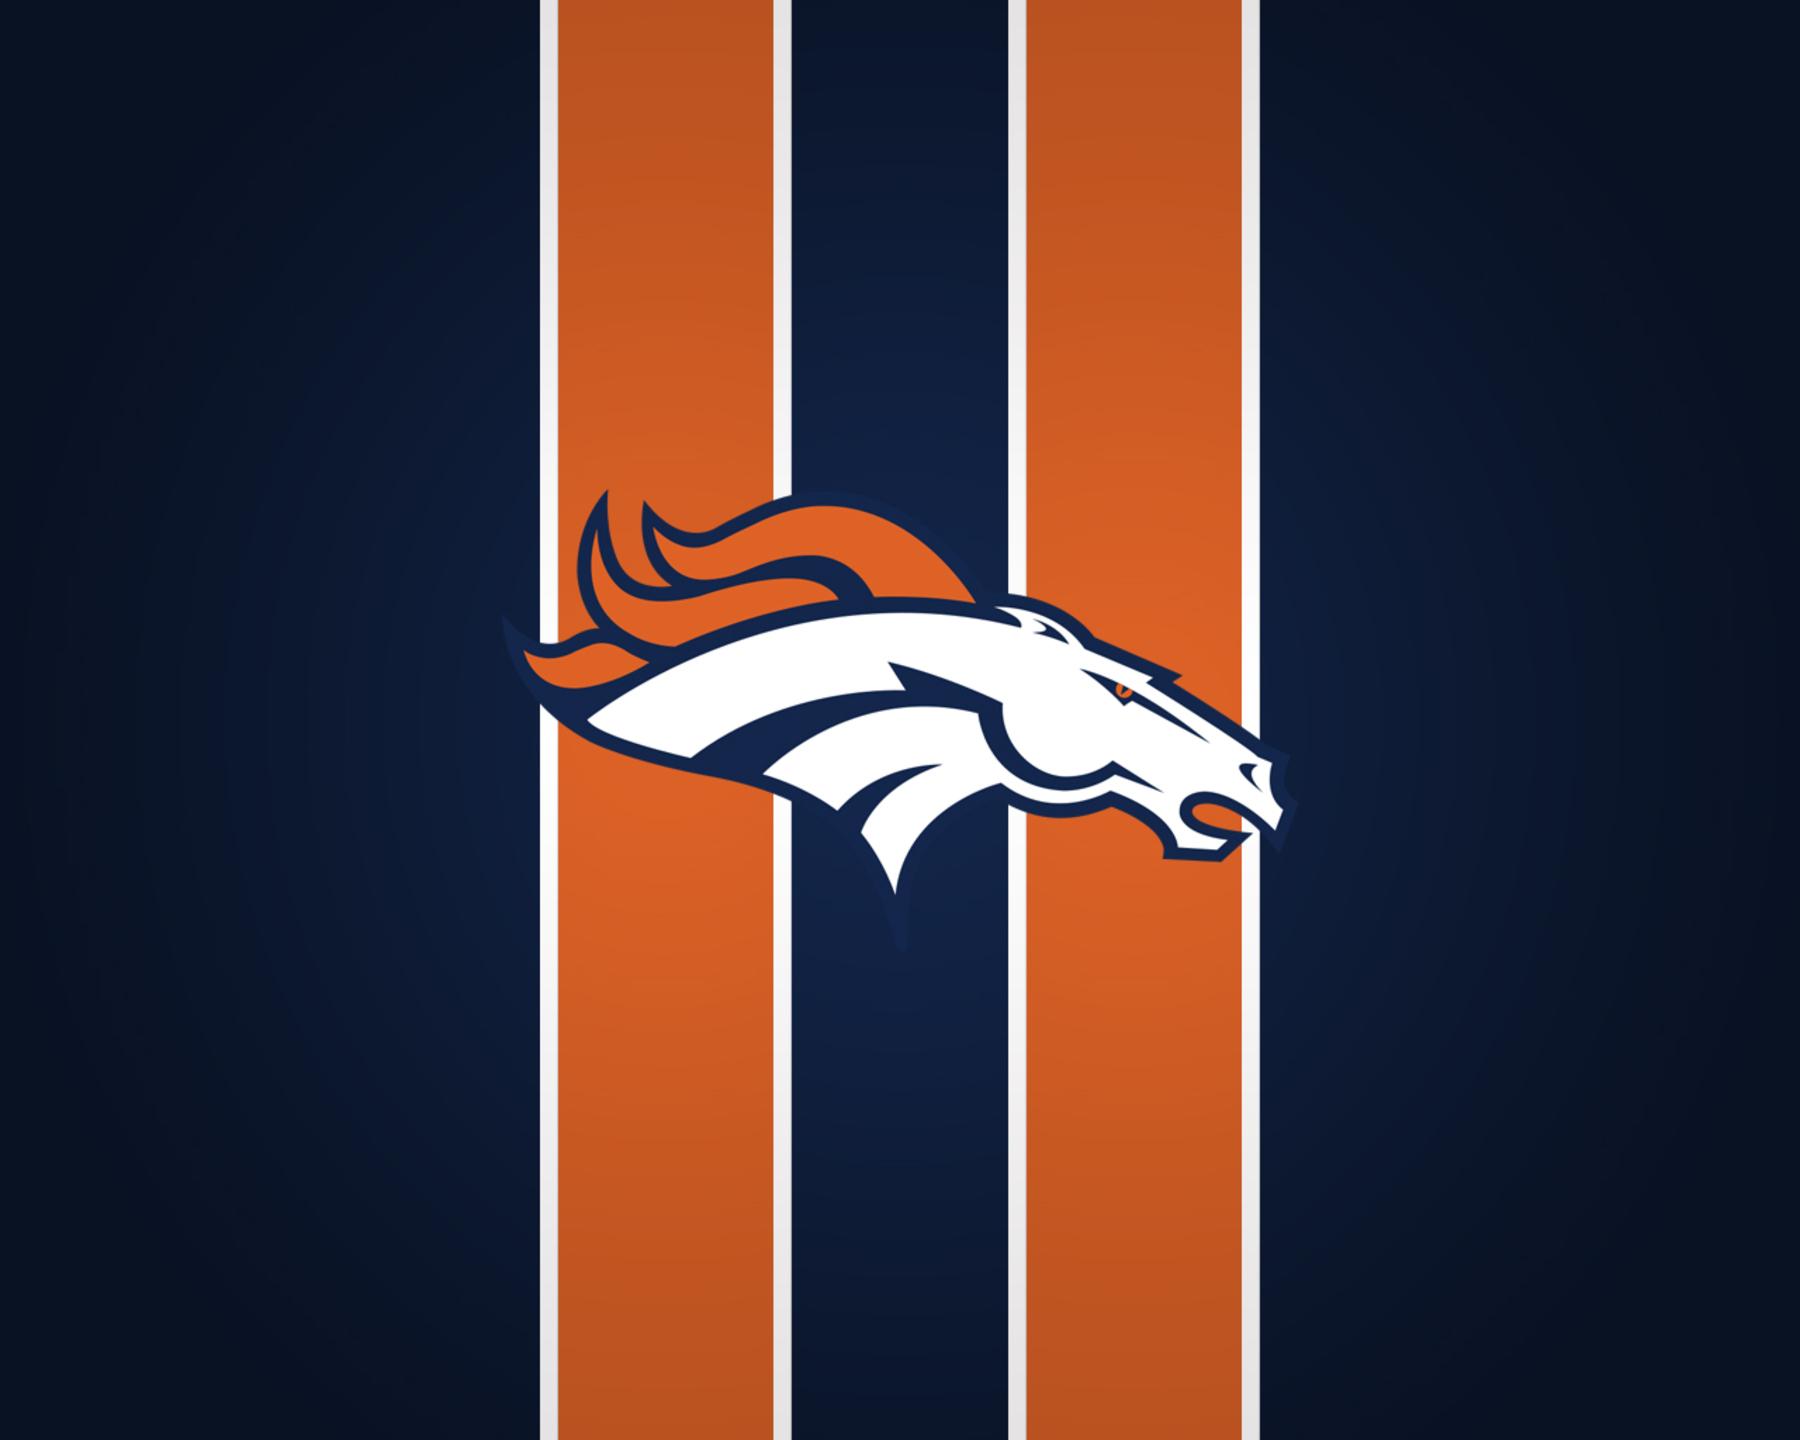 Broncos Wallpapers Wallpaperup 1800x1440